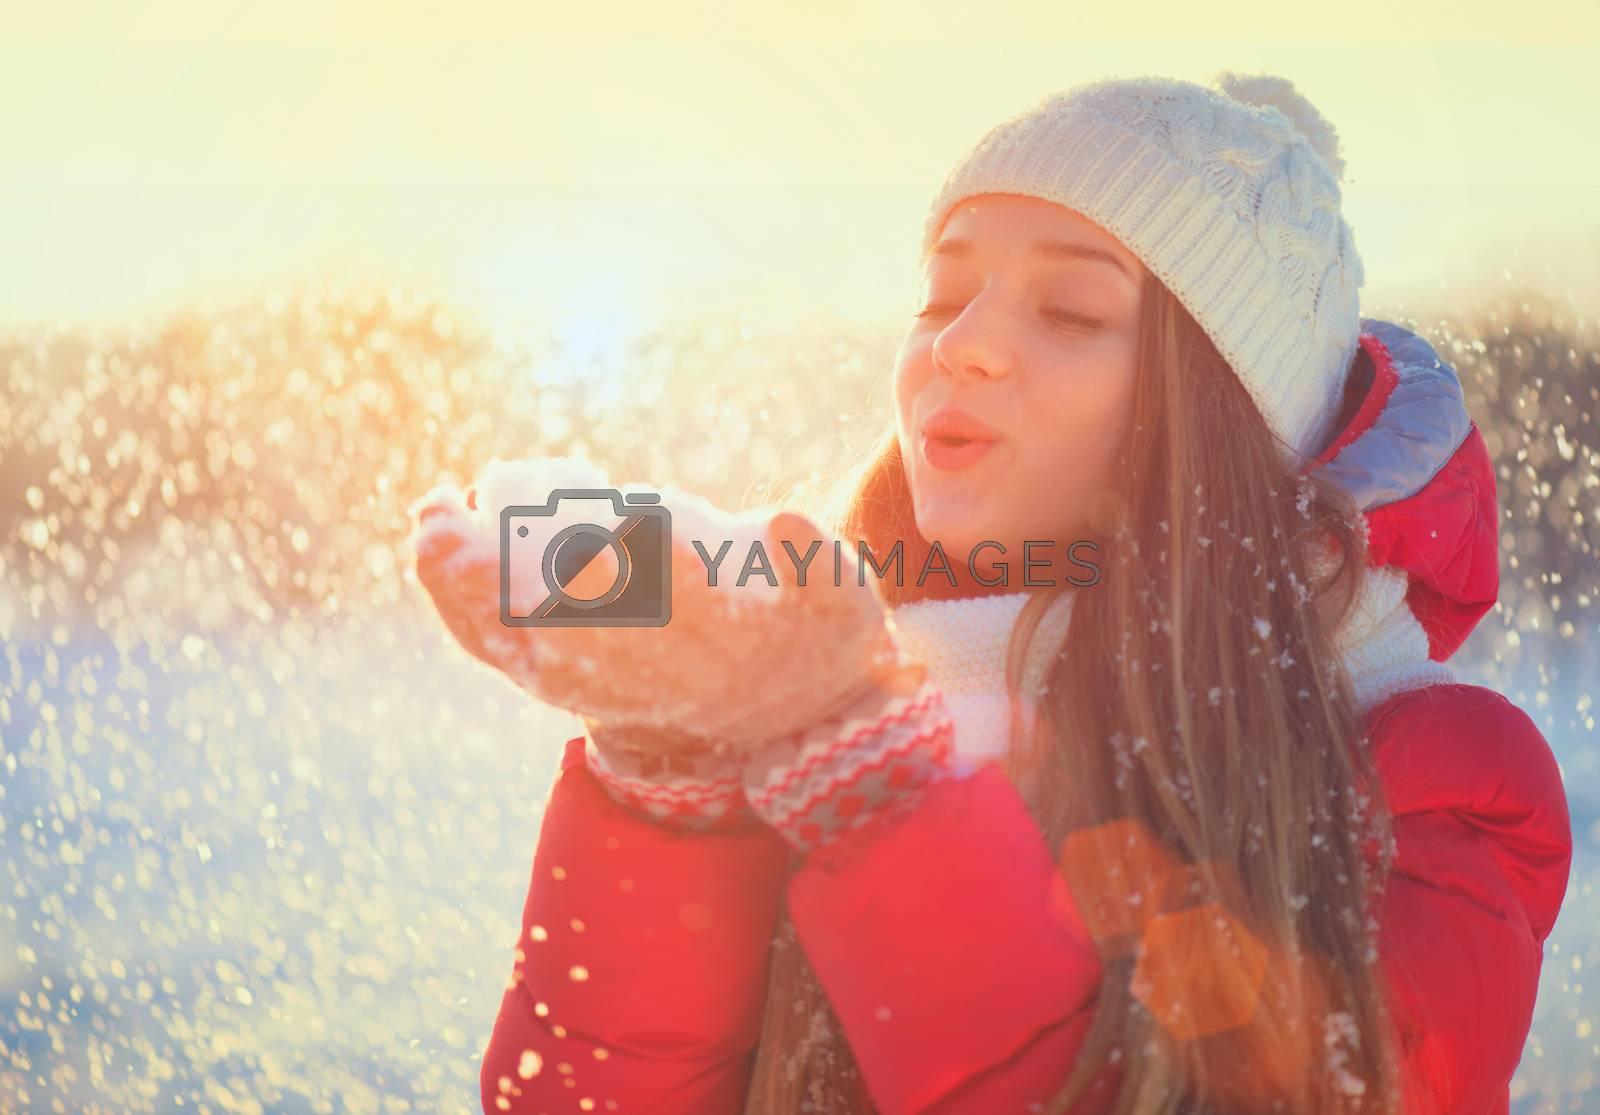 Beauty Winter Girl Having Fun in Winter Park by SubbotinaA